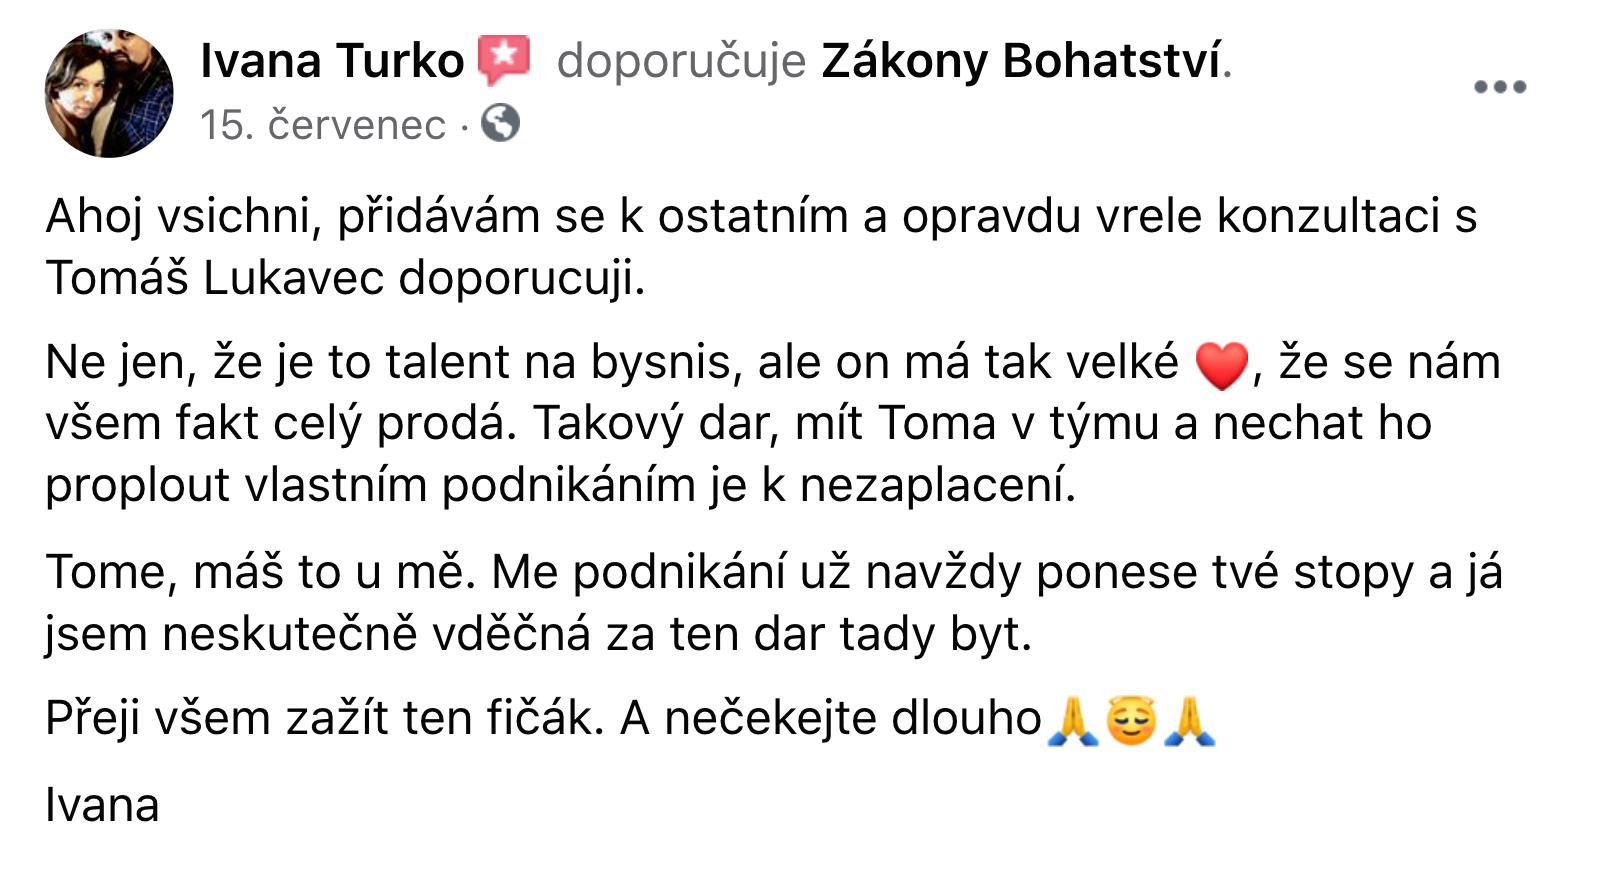 Reference - Ivana Turko